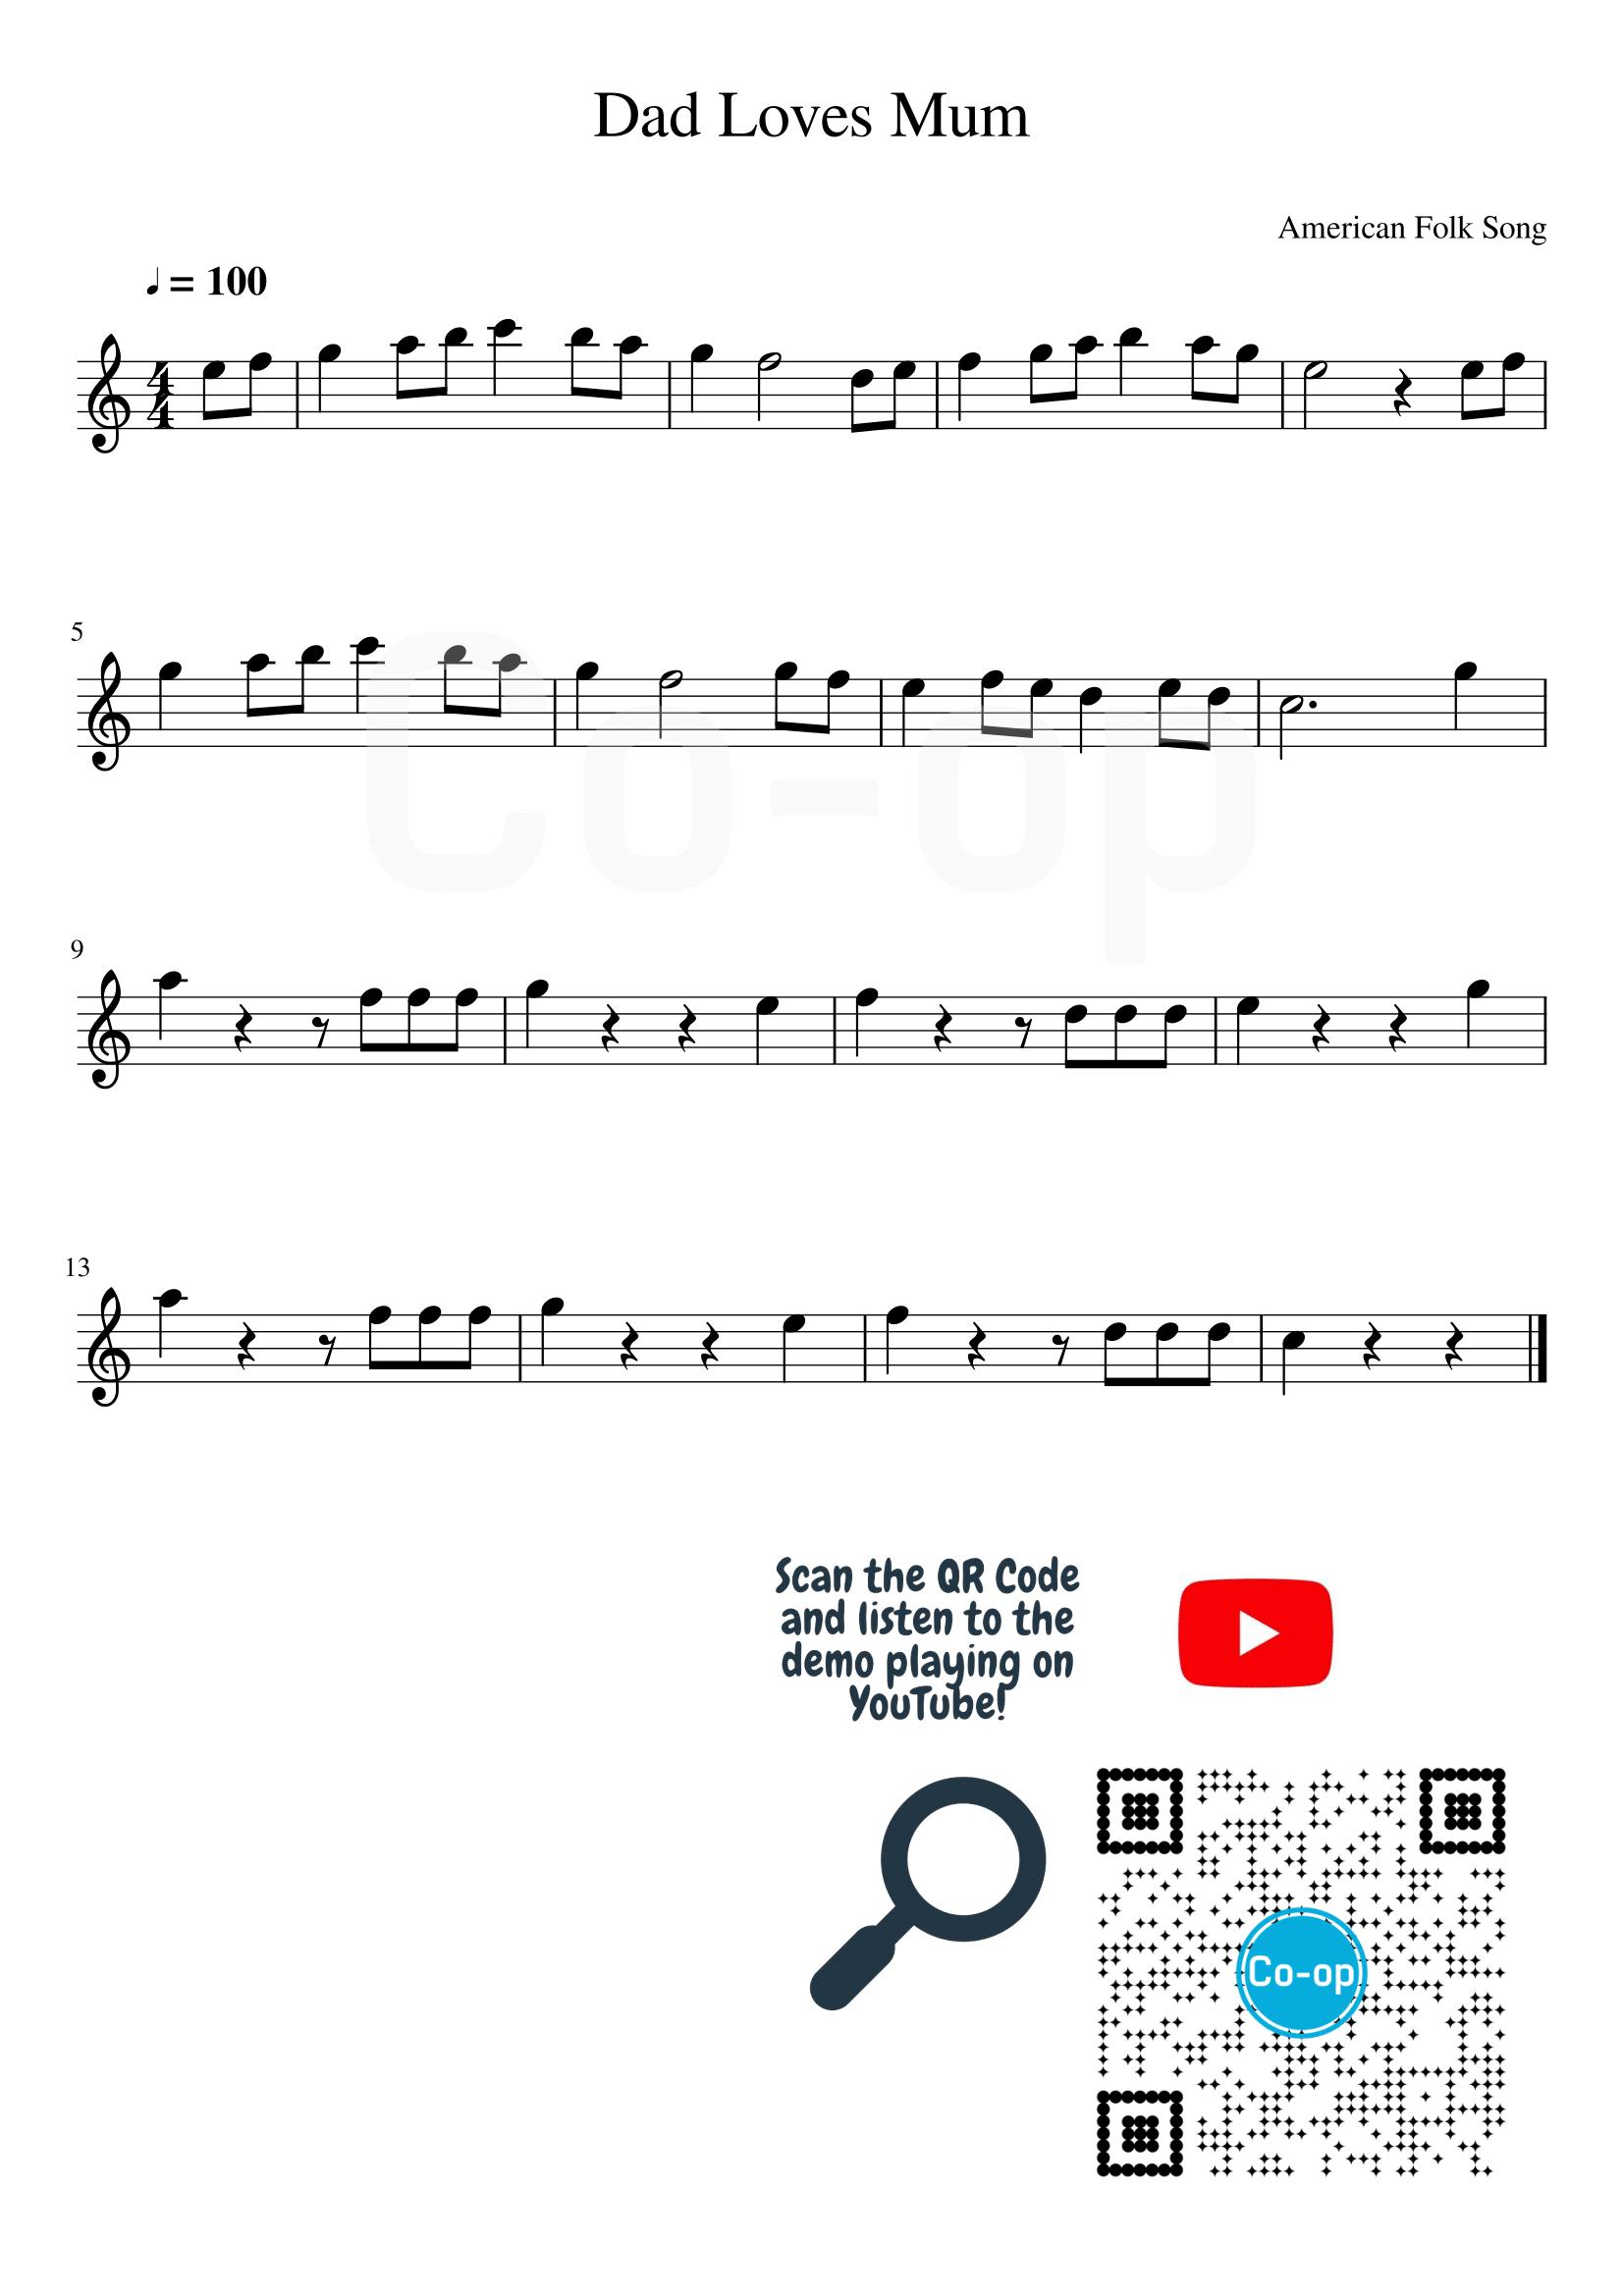 Dad Loves Mum | Staff Notation | Free Sheet Music